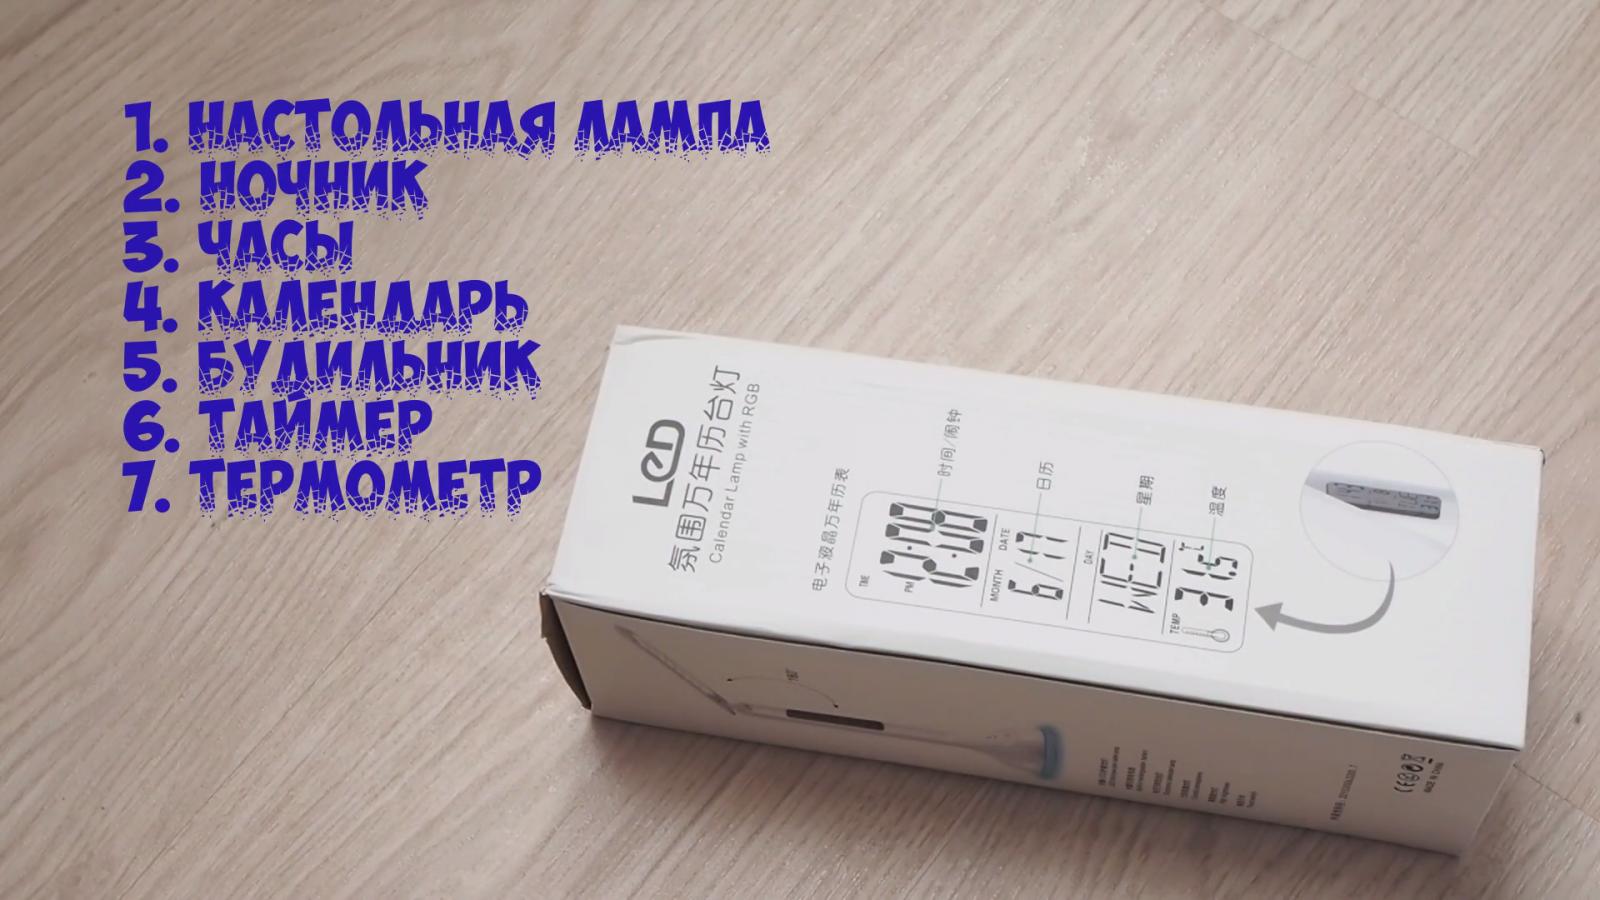 GearBest: Настольная LED лампа, ночник, часы, календарь, термометр, будильник